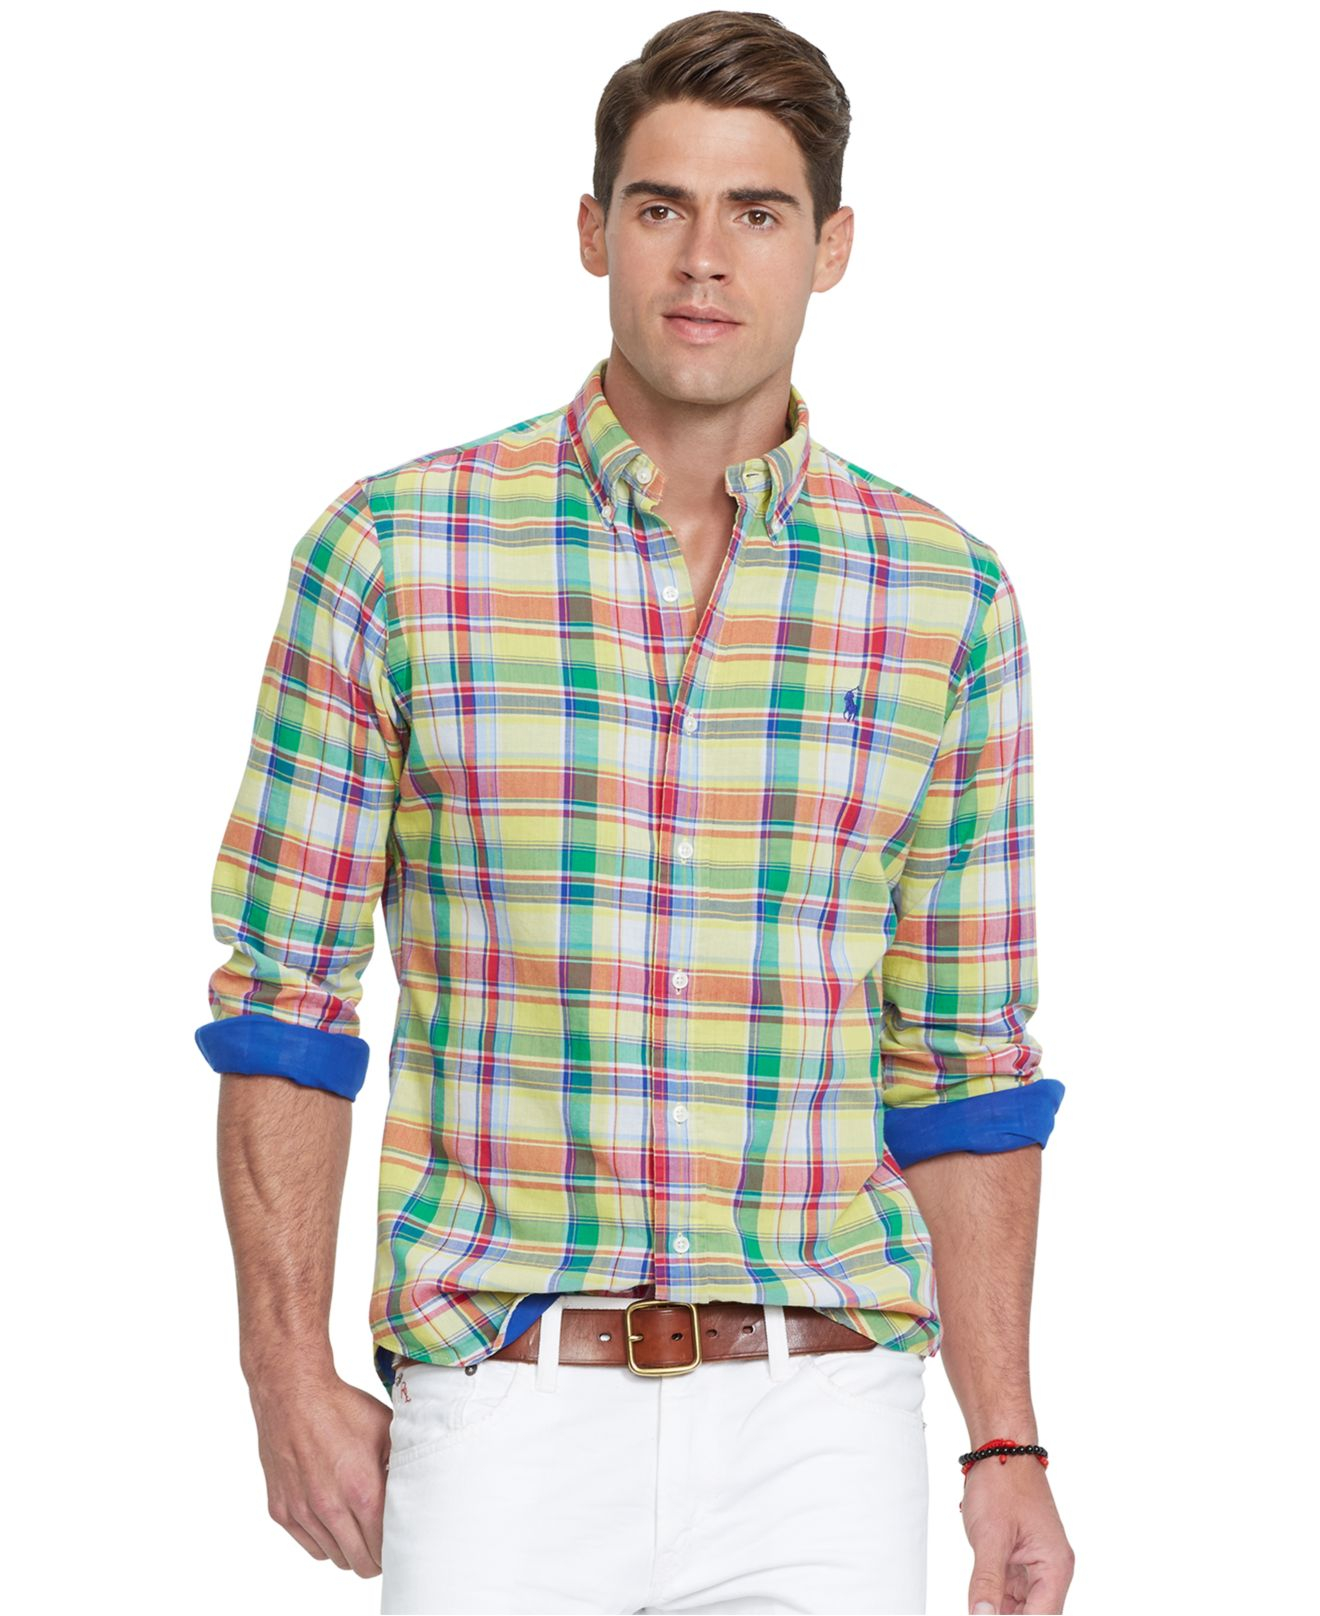 Lyst polo ralph lauren double faced poplin shirt in blue for What is a poplin shirt